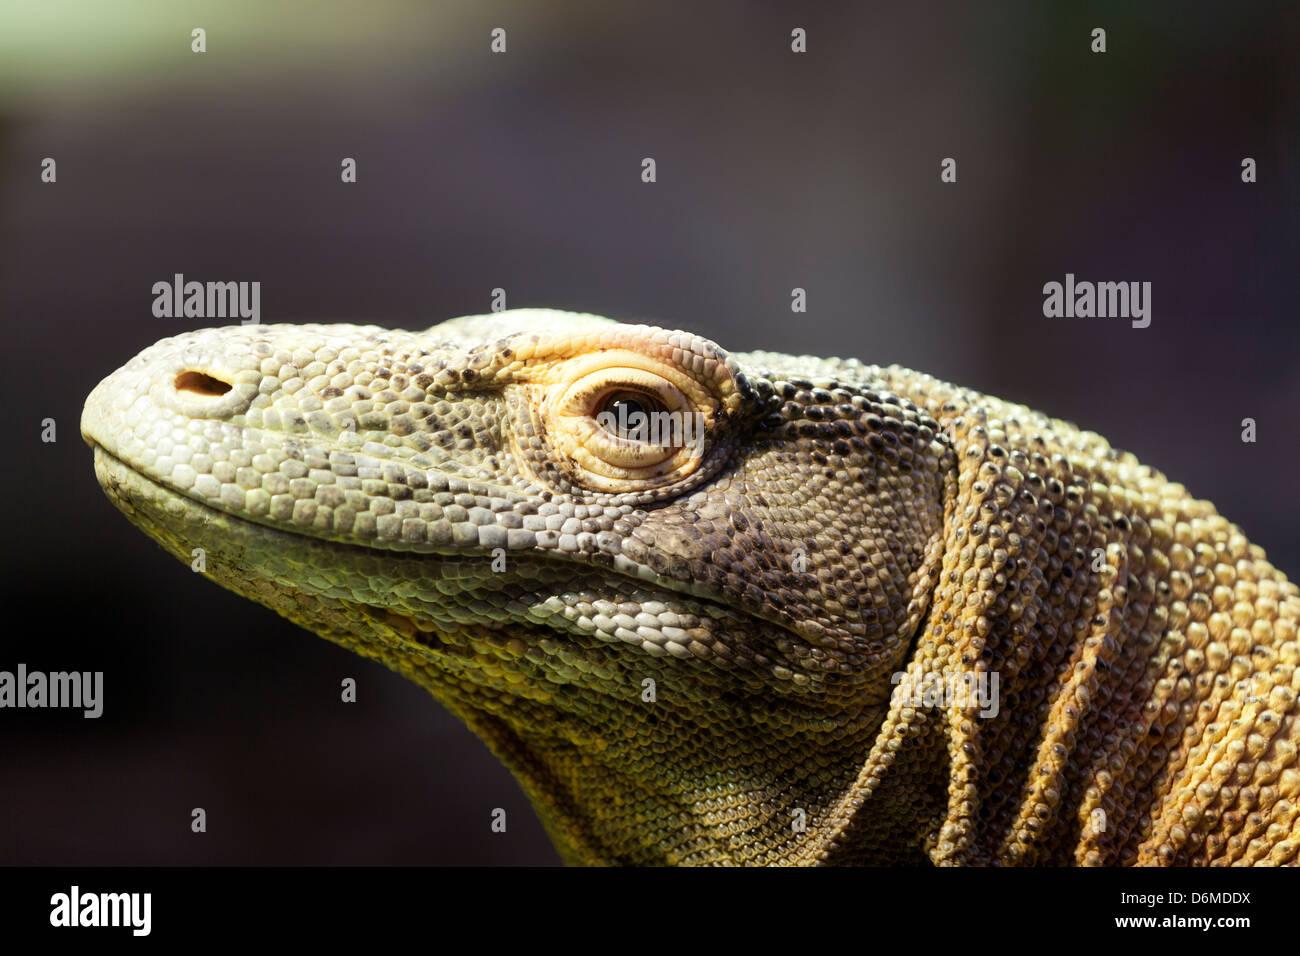 Dragon de Komodo, portrait d'un Dragon de Komodo. Banque D'Images